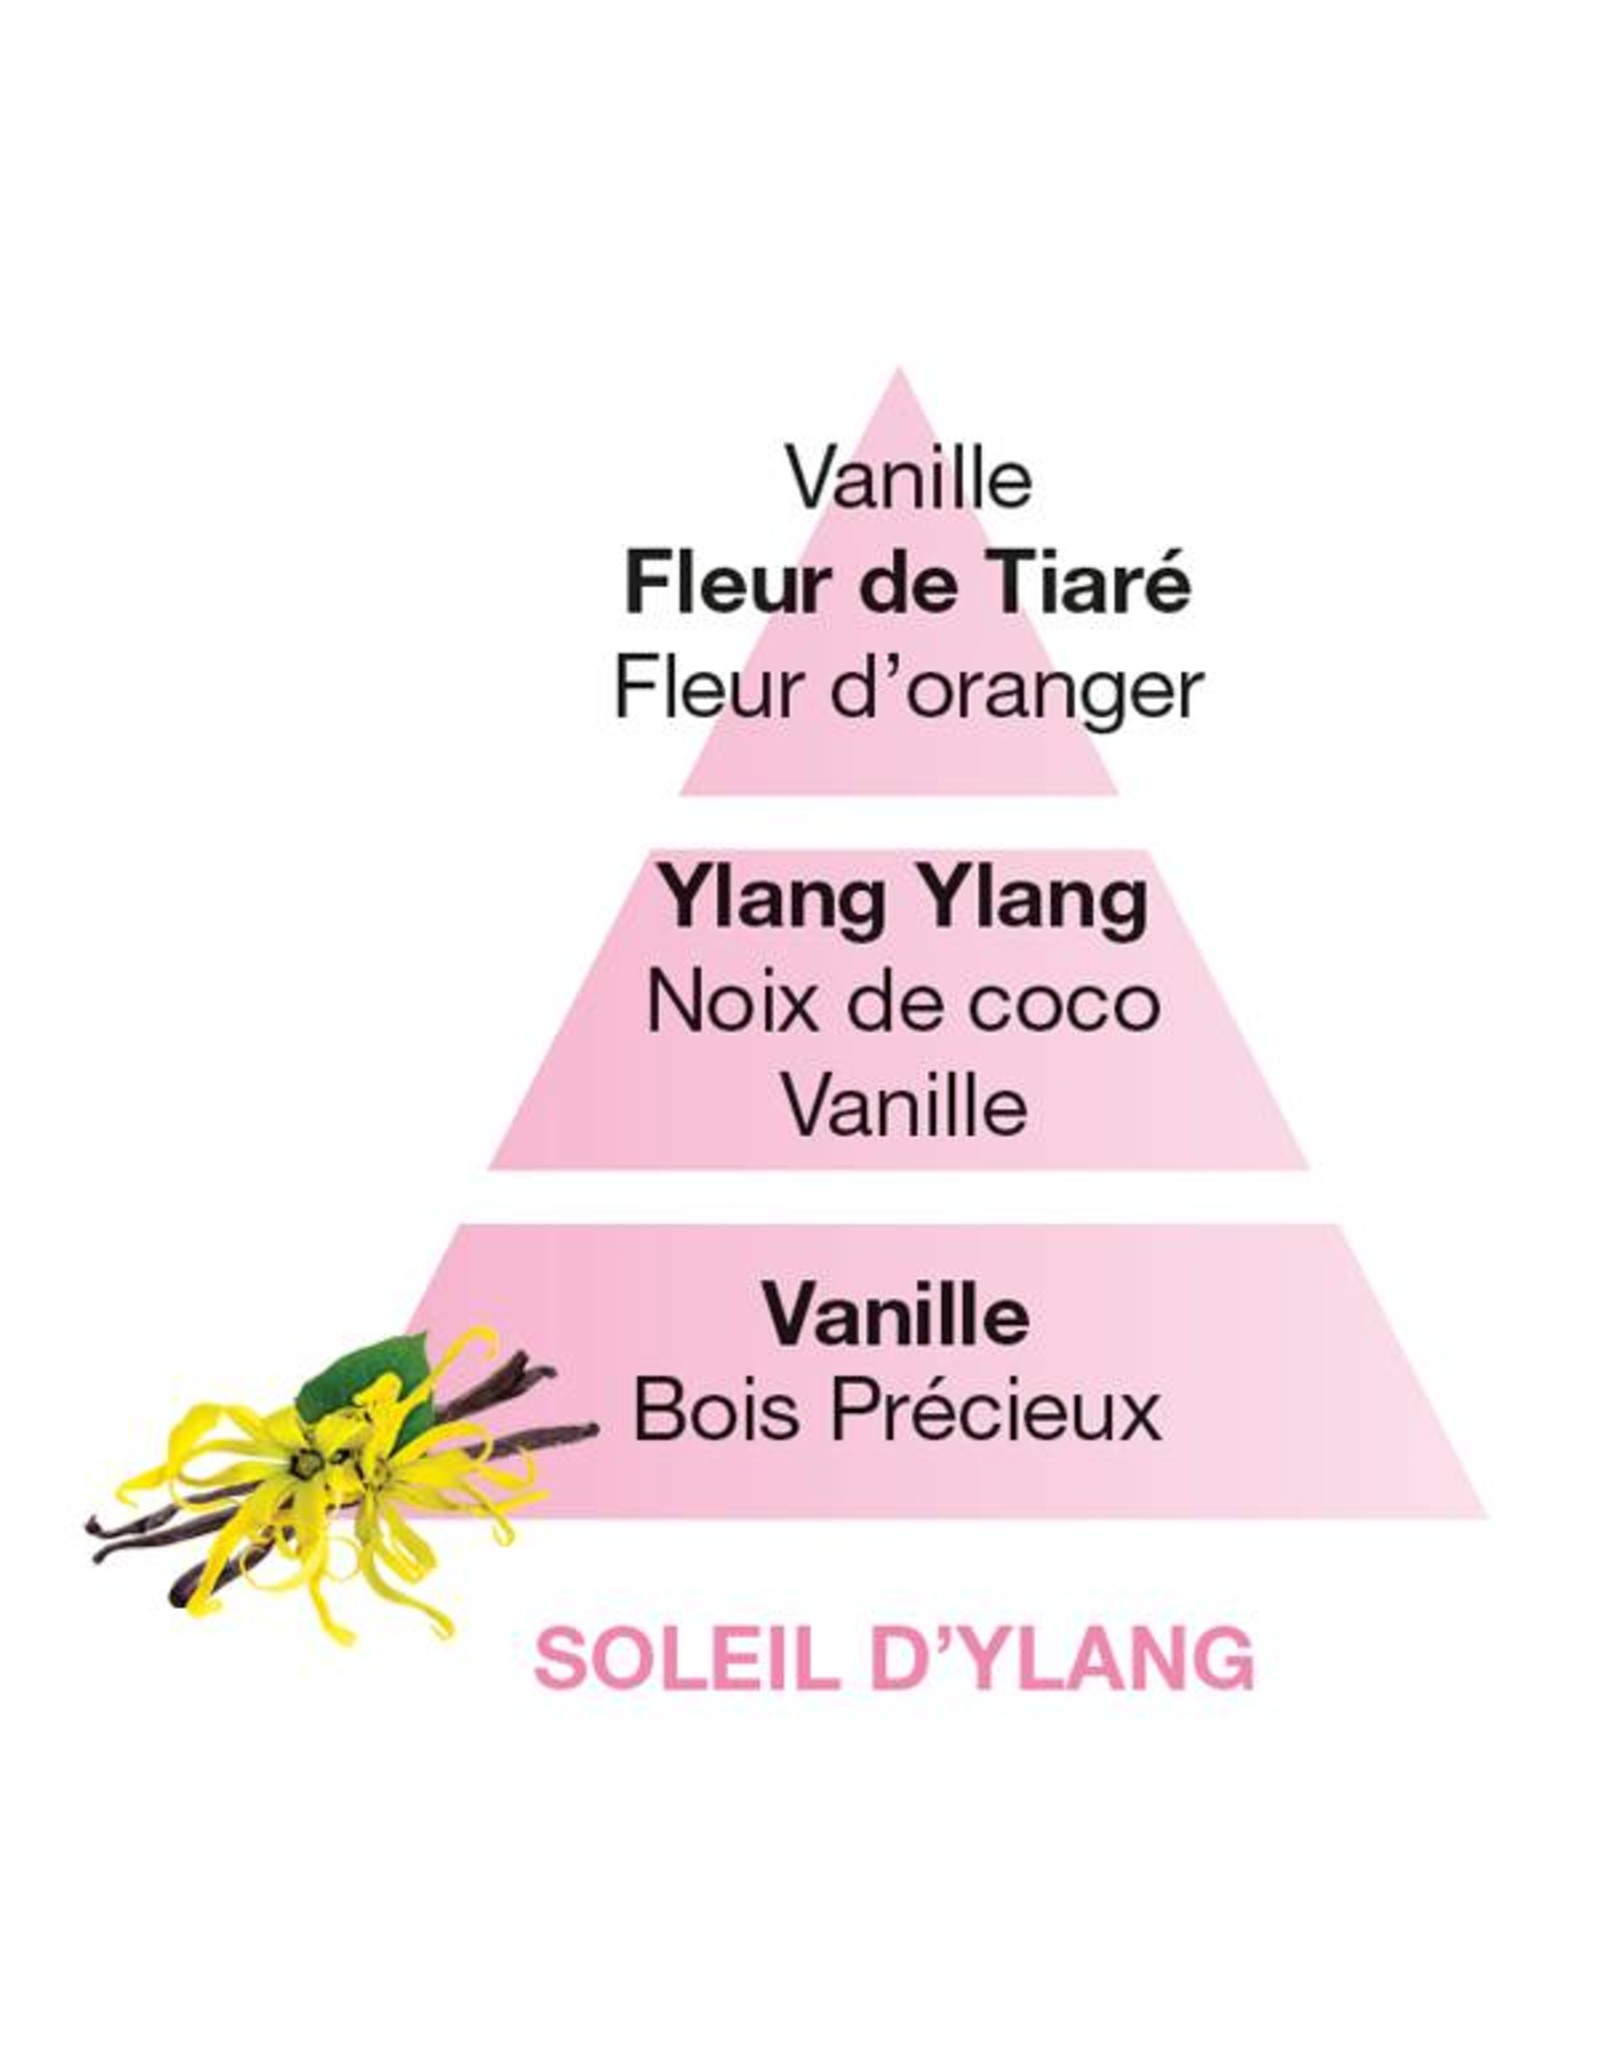 Lampe Berger Navulling - Fleurs - Soleil d'Ylang